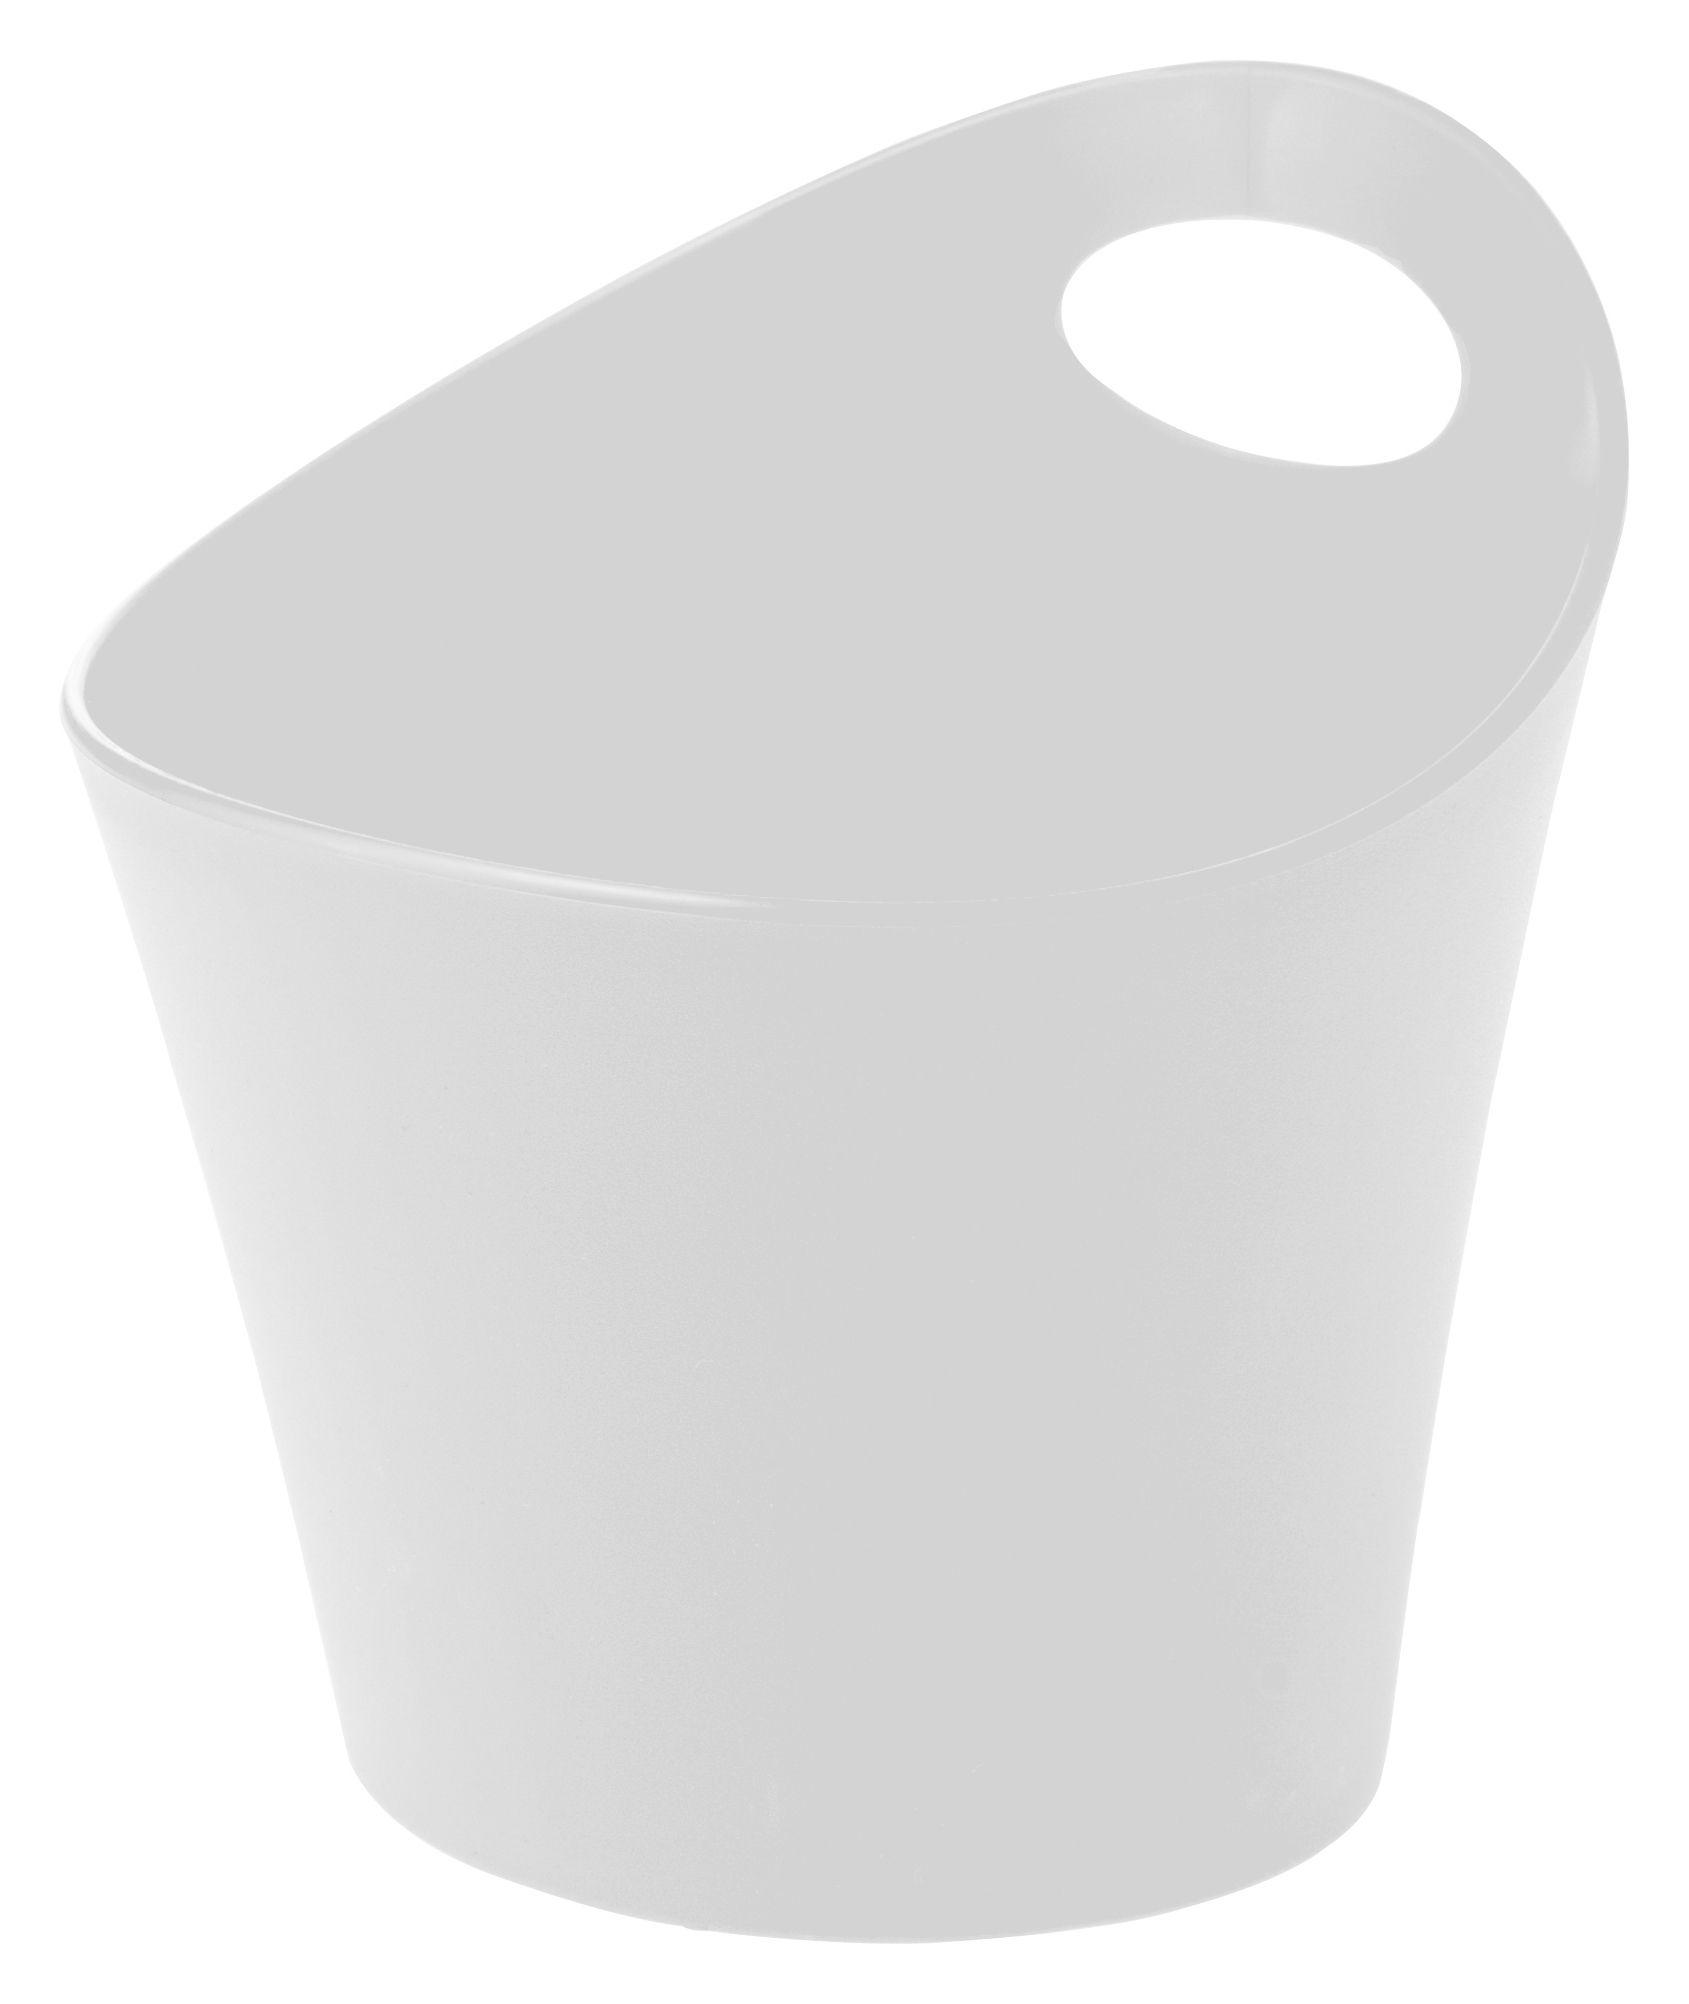 Dekoration - Badezimmer - Pottichelli XS Topf - Koziol - Weiß - PMMA